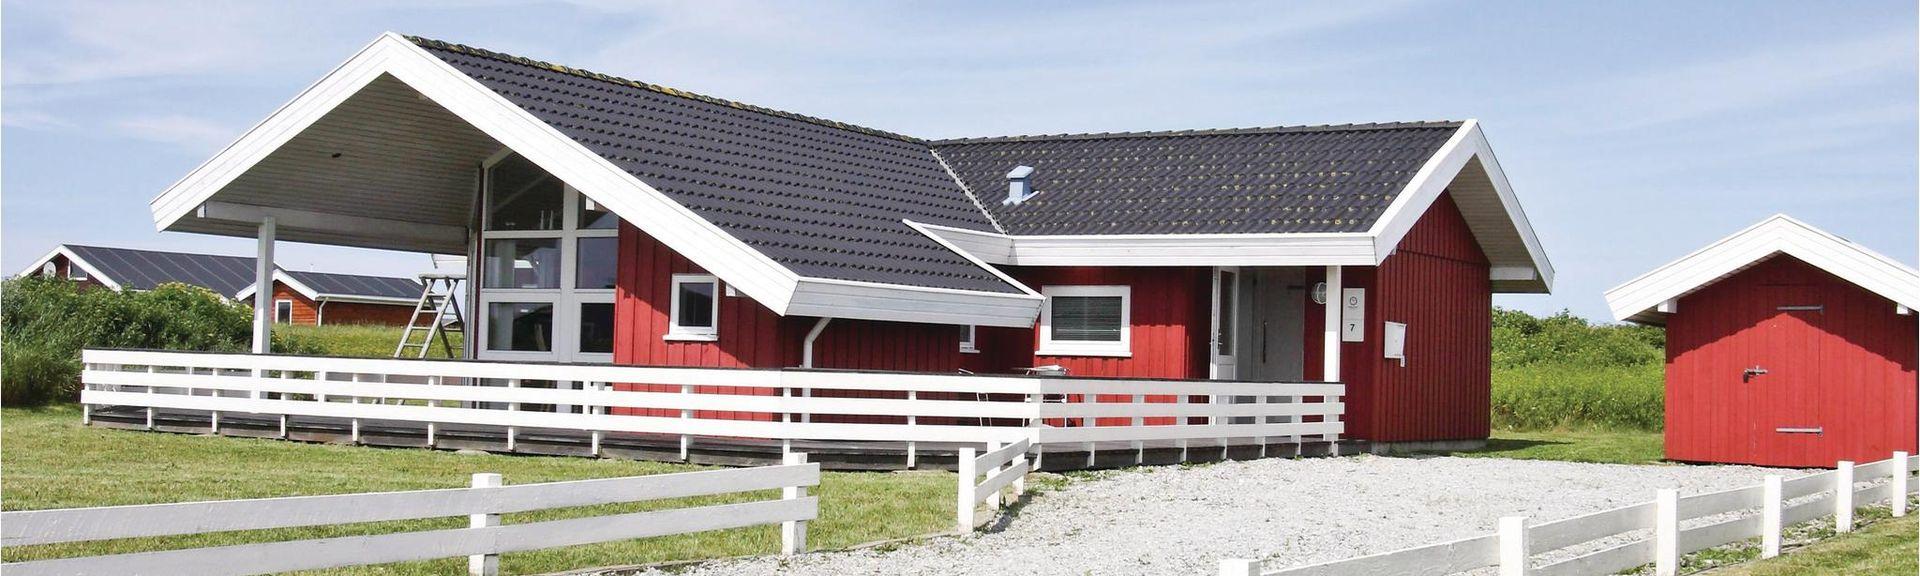 Sindal Station, Sindal, North Denmark Region, Denmark